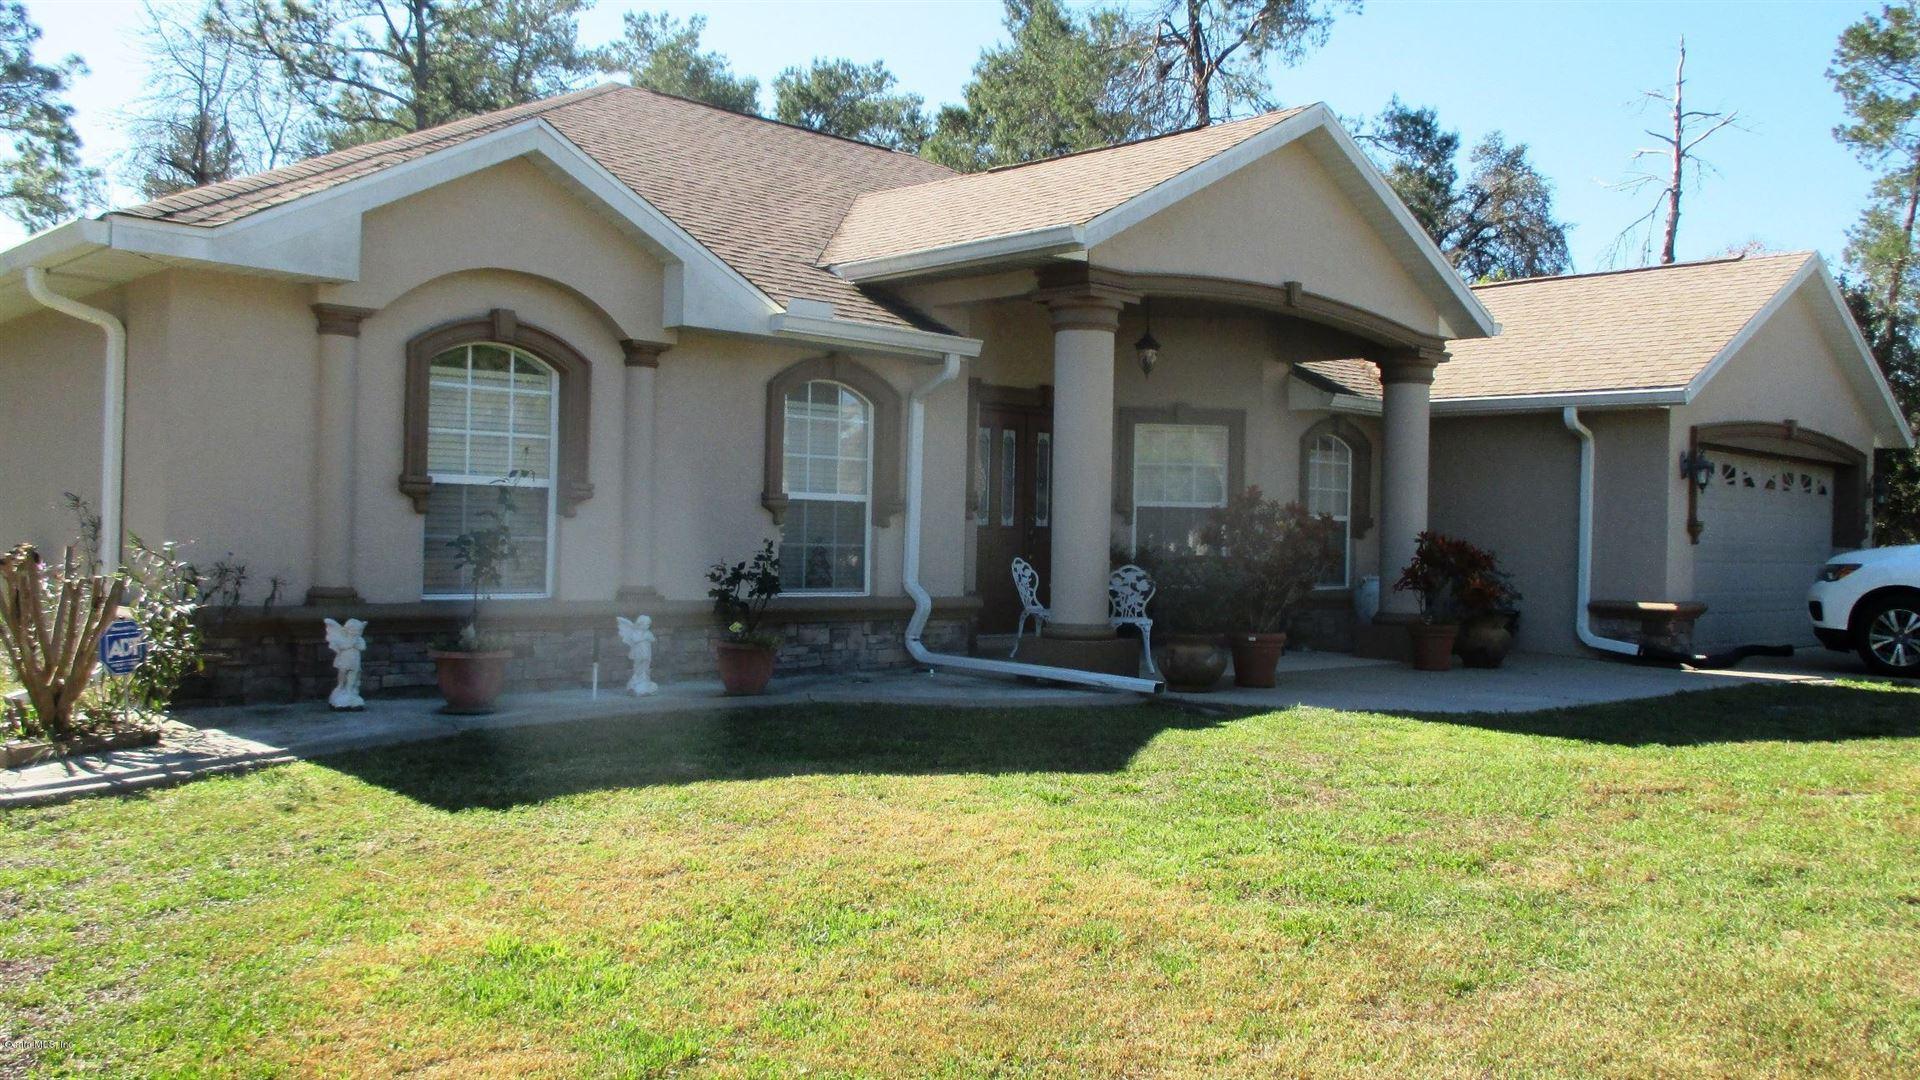 208 Marion Oaks Trail, Ocala, FL 34473 - MLS#: 569170